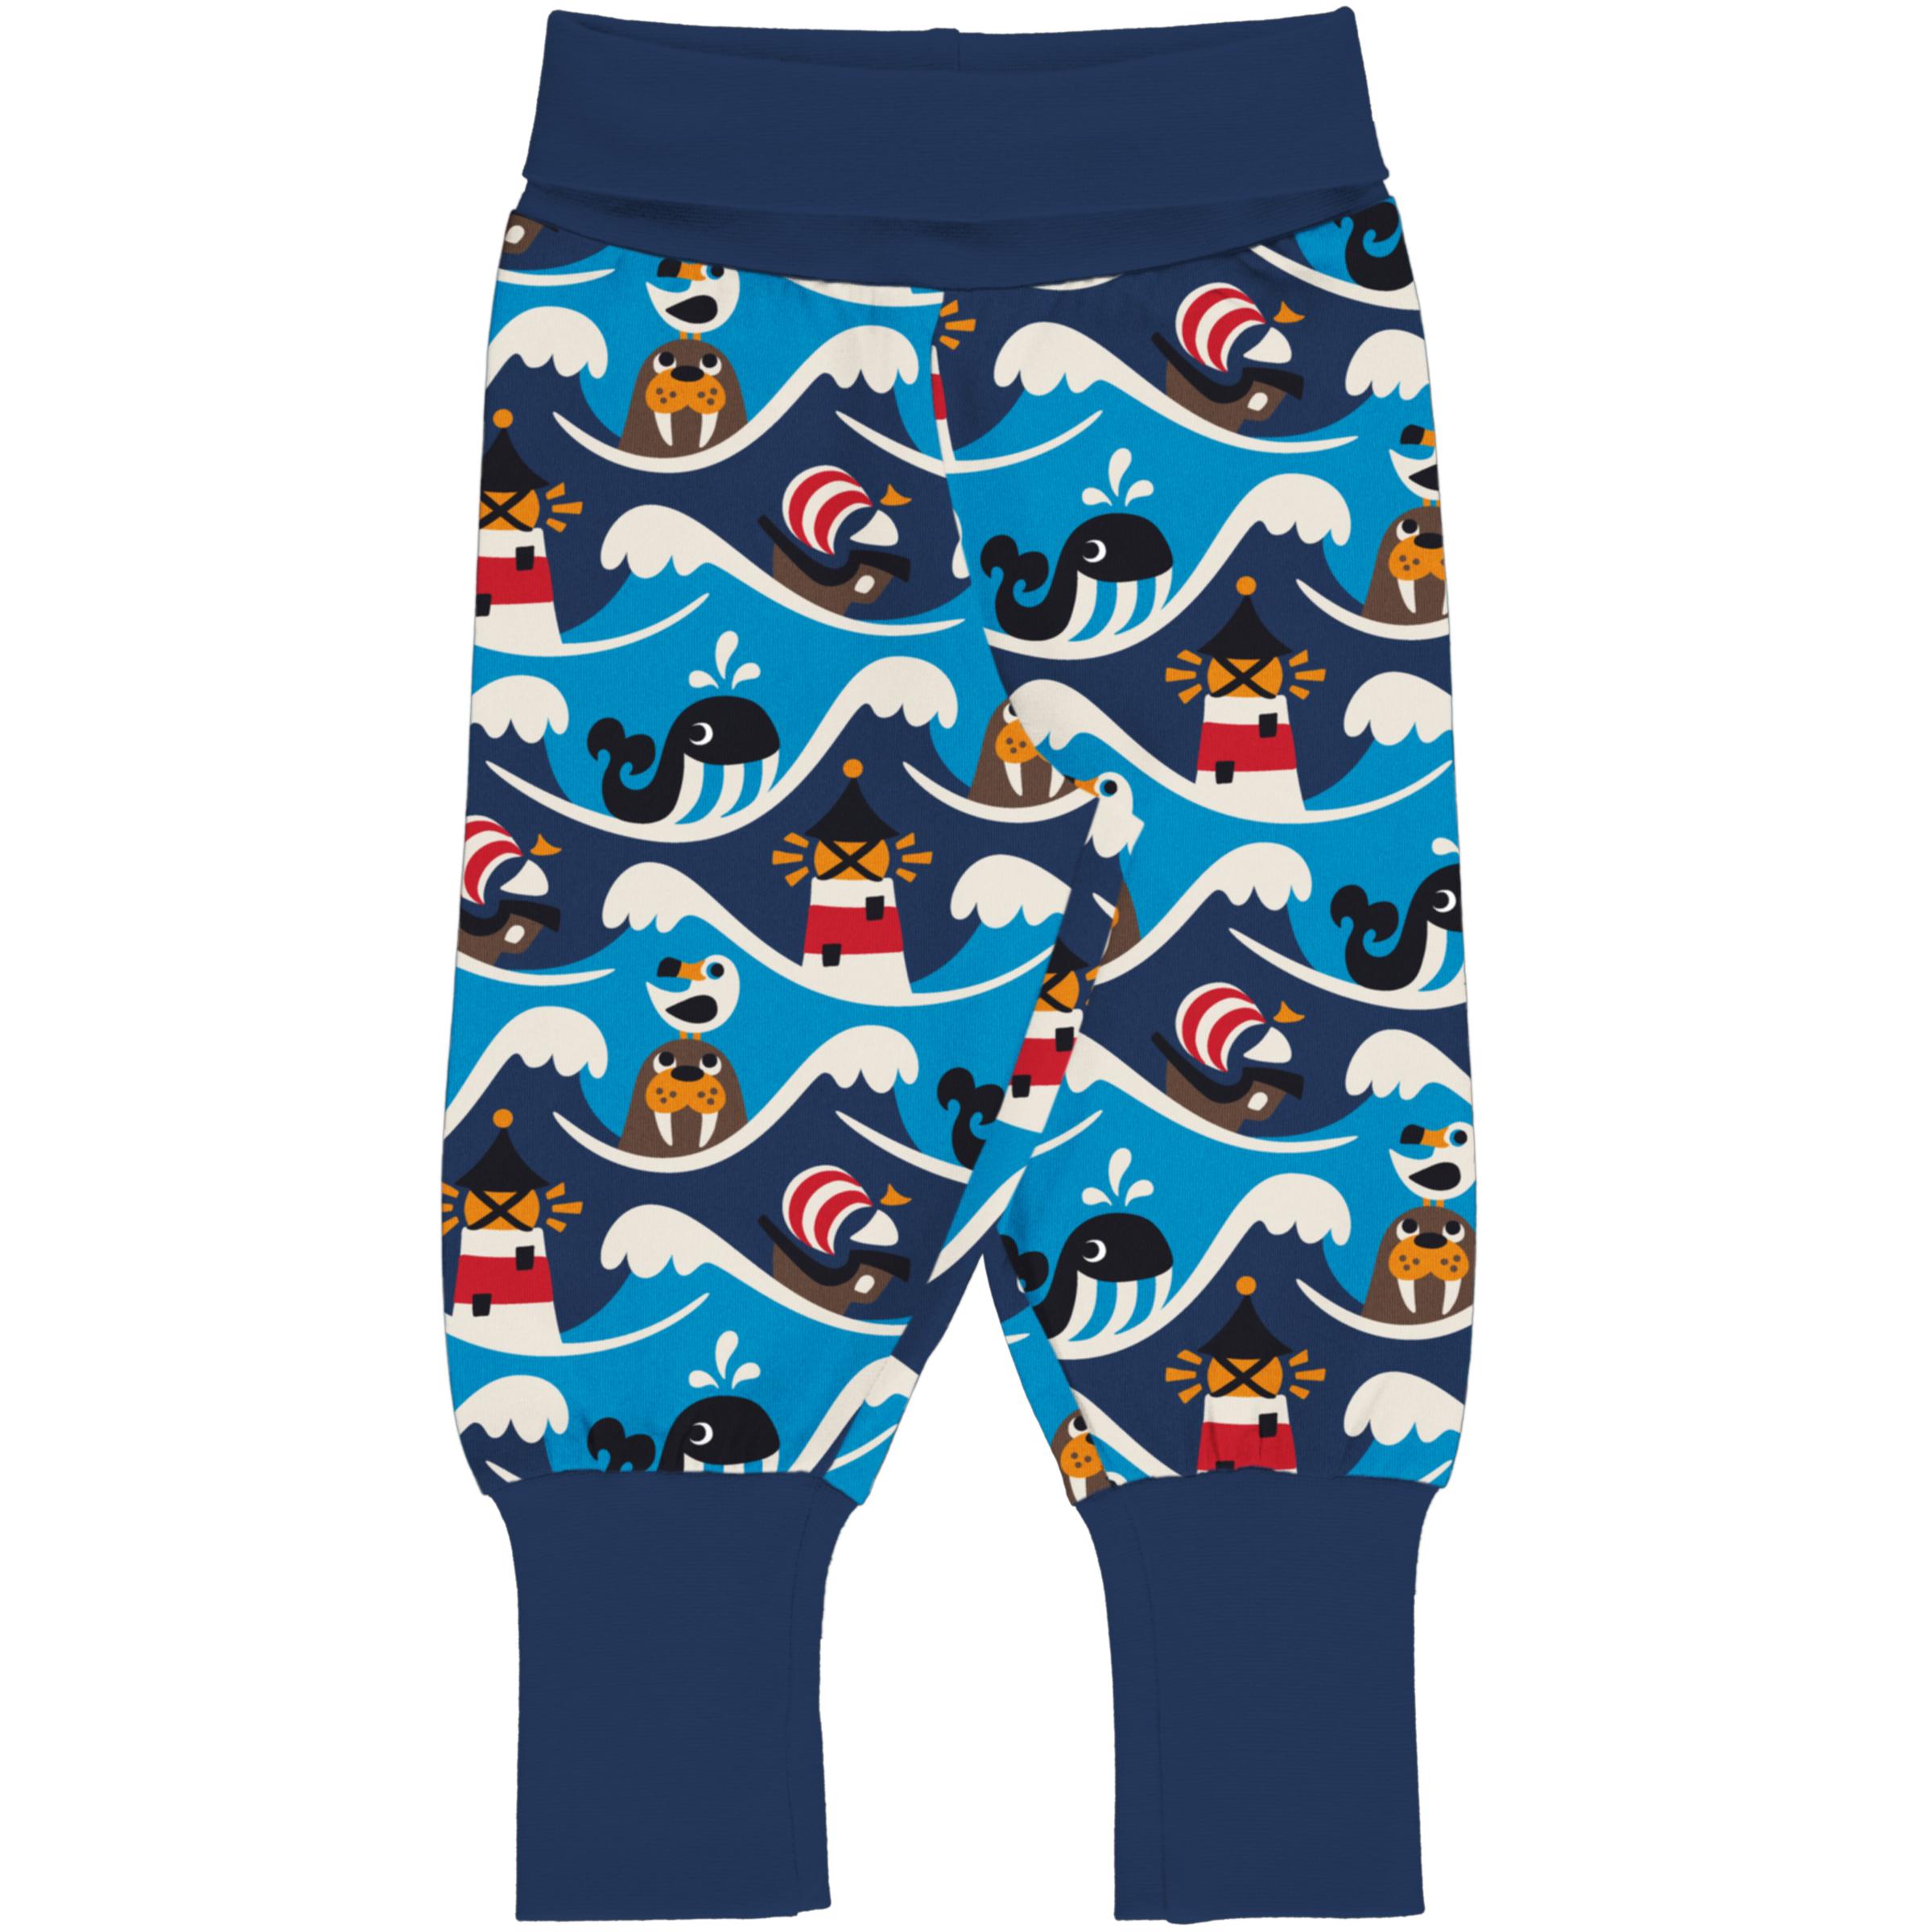 Maxomorra Baby Rib Pants OCEAN 050/056